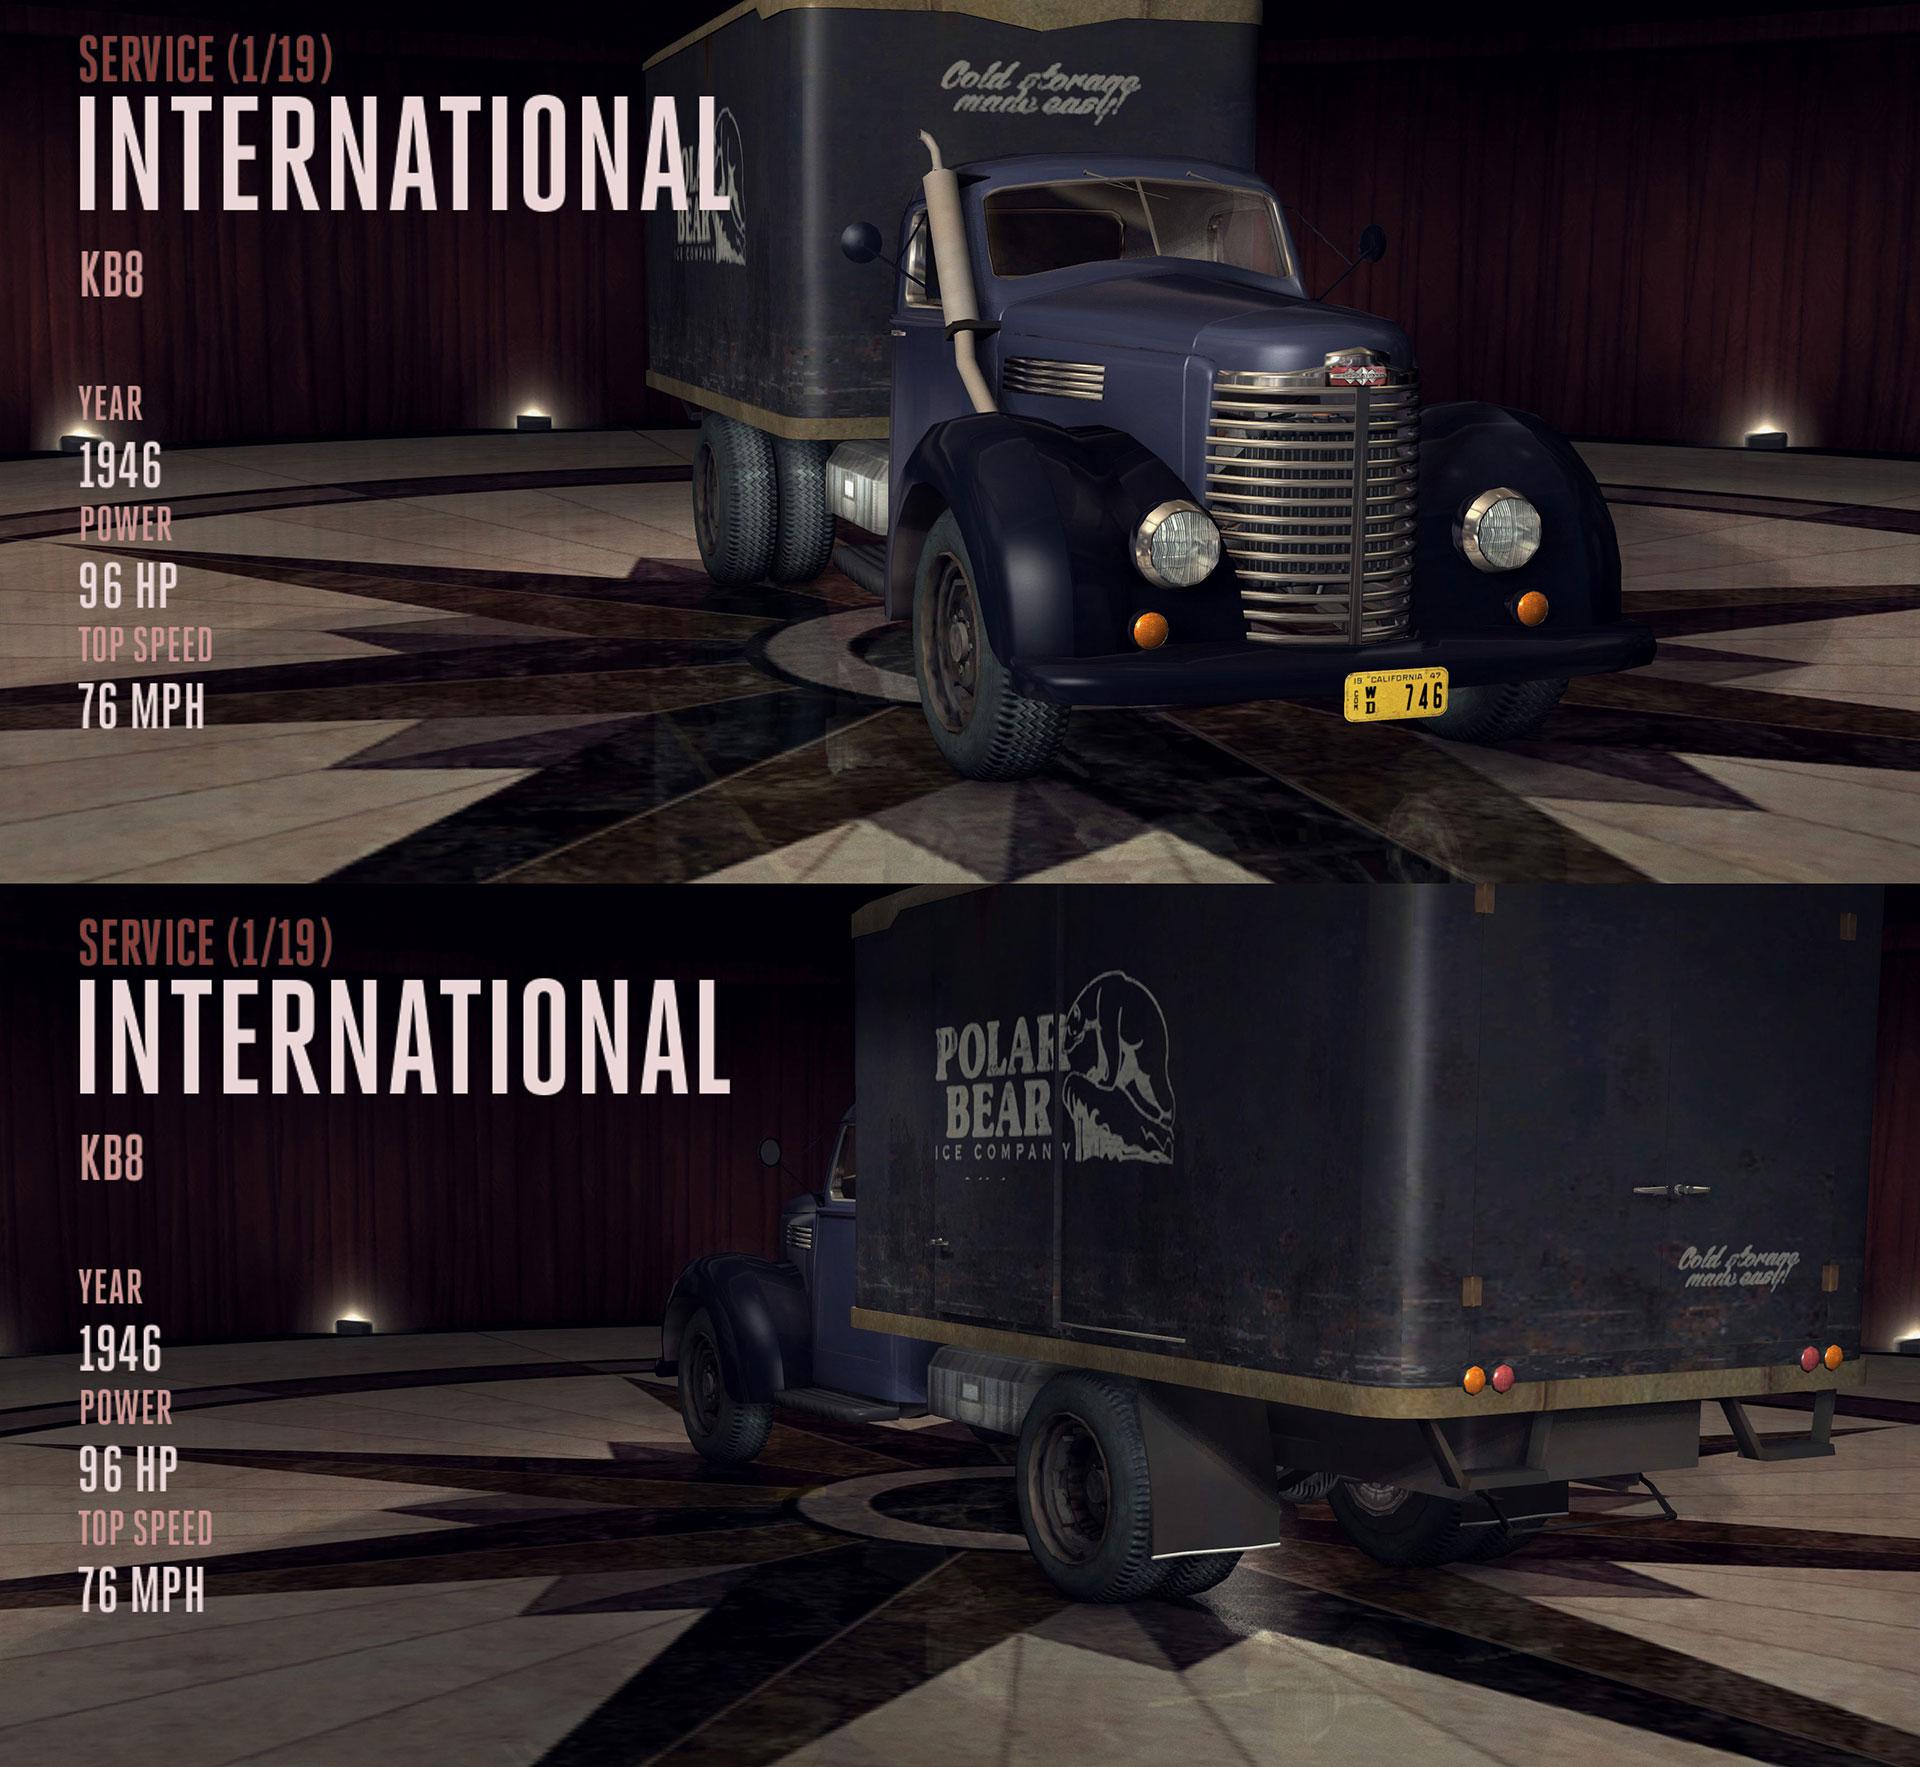 File:1946-international-kb8-polar-bear-ice-truck.jpg